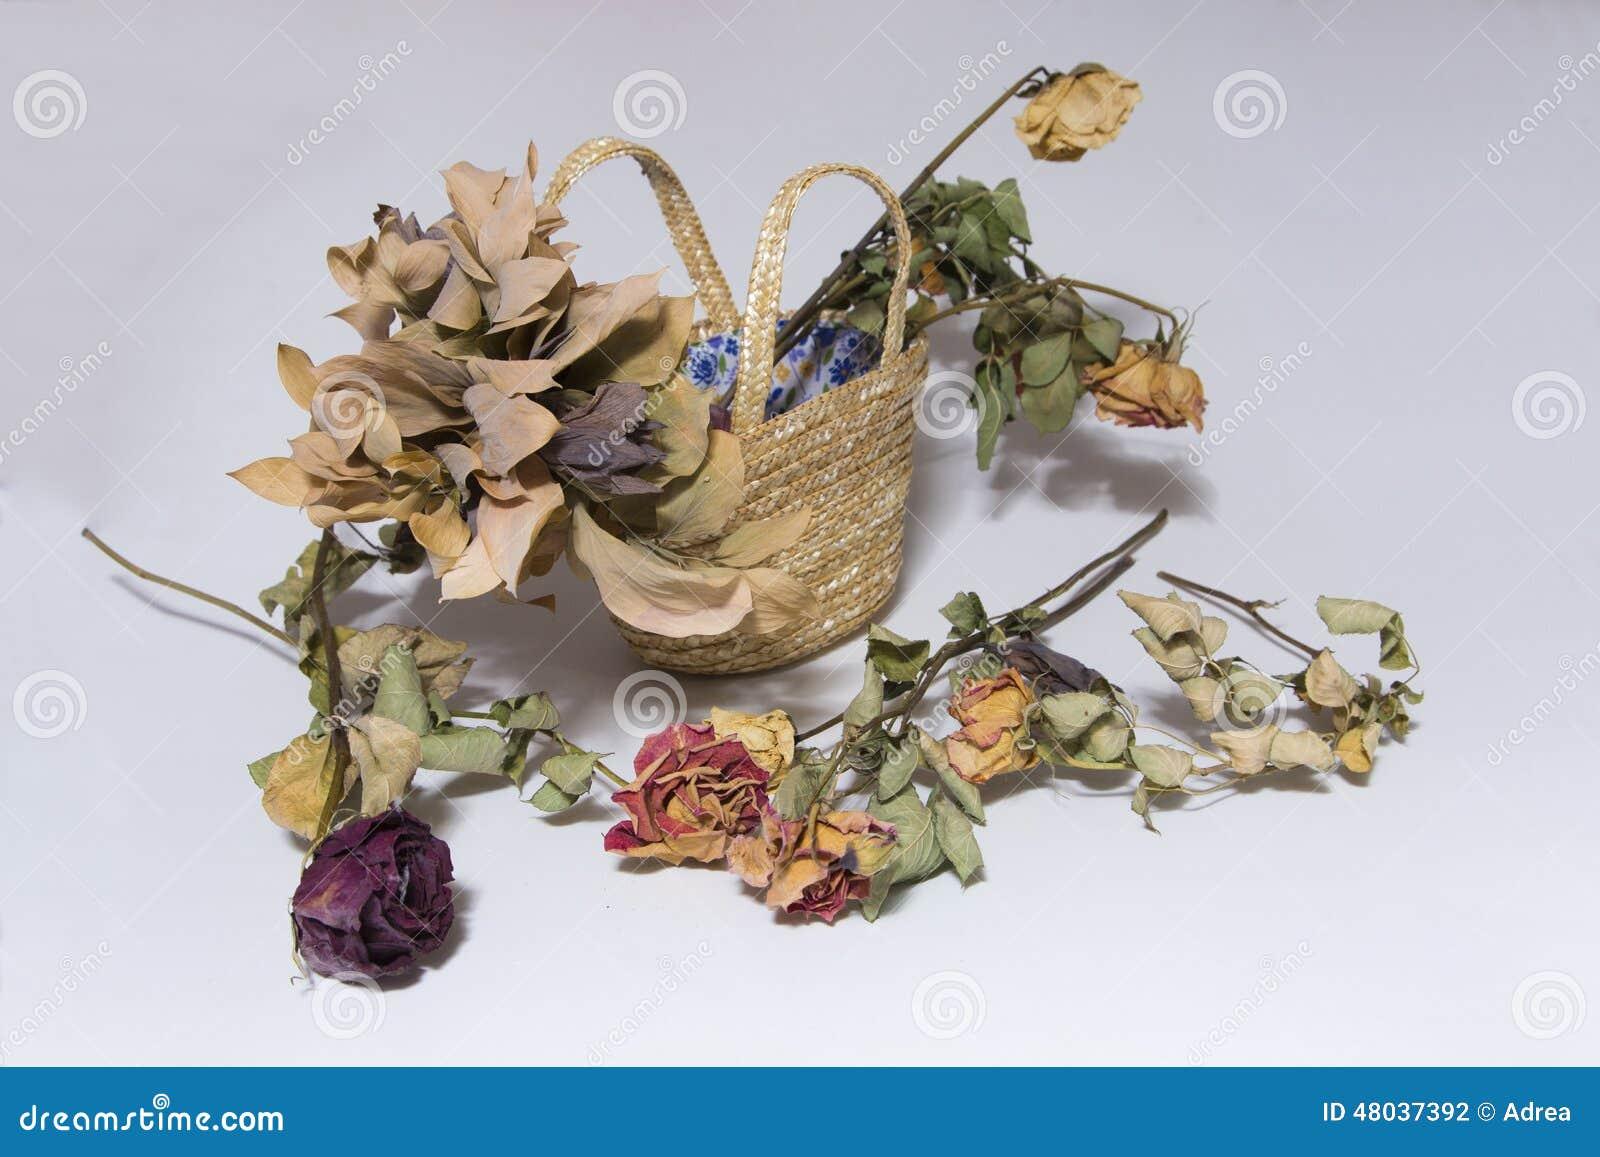 Dead Flowers Stock Photo Image Of Beauty Love Beautiful 48037392